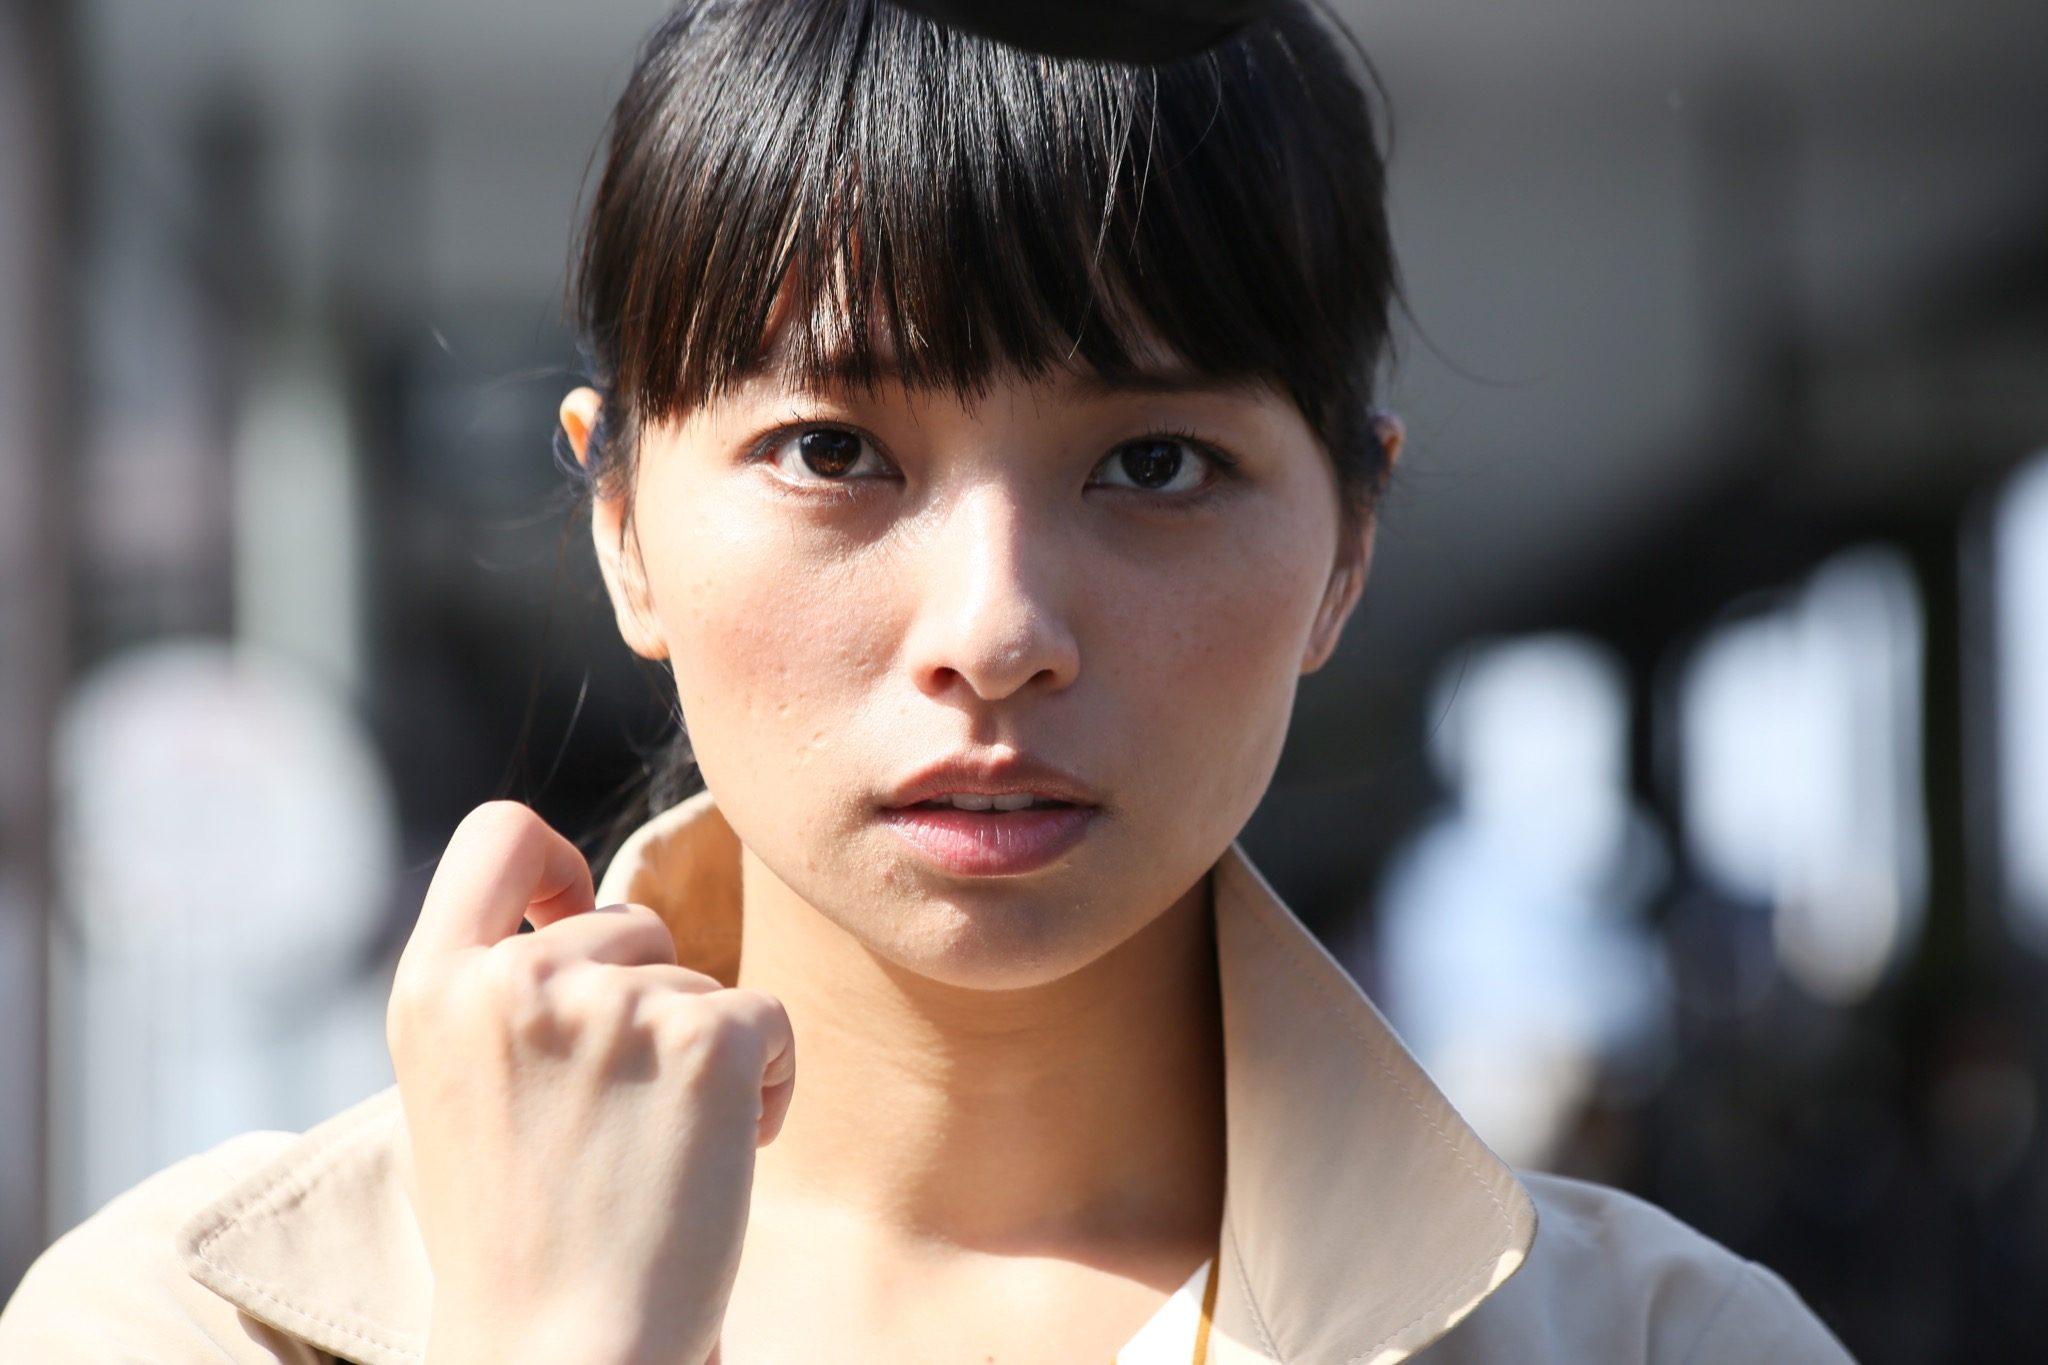 Vers la lumière de Naomi Kawase photo 3